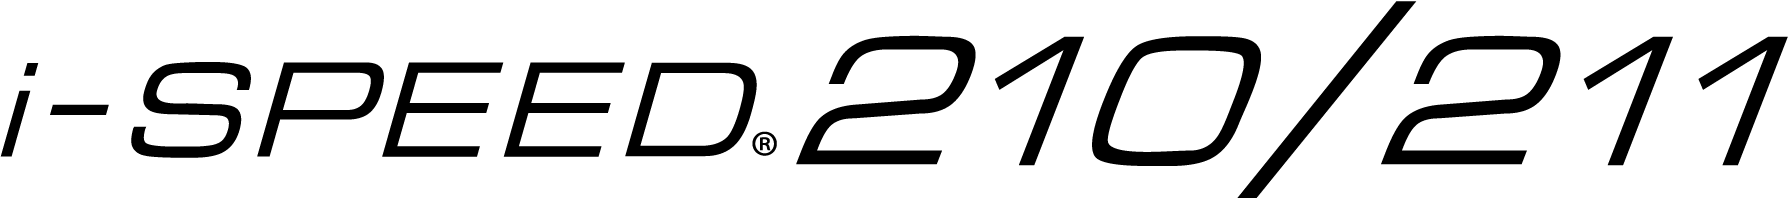 i-SPEED 210/211 logo.